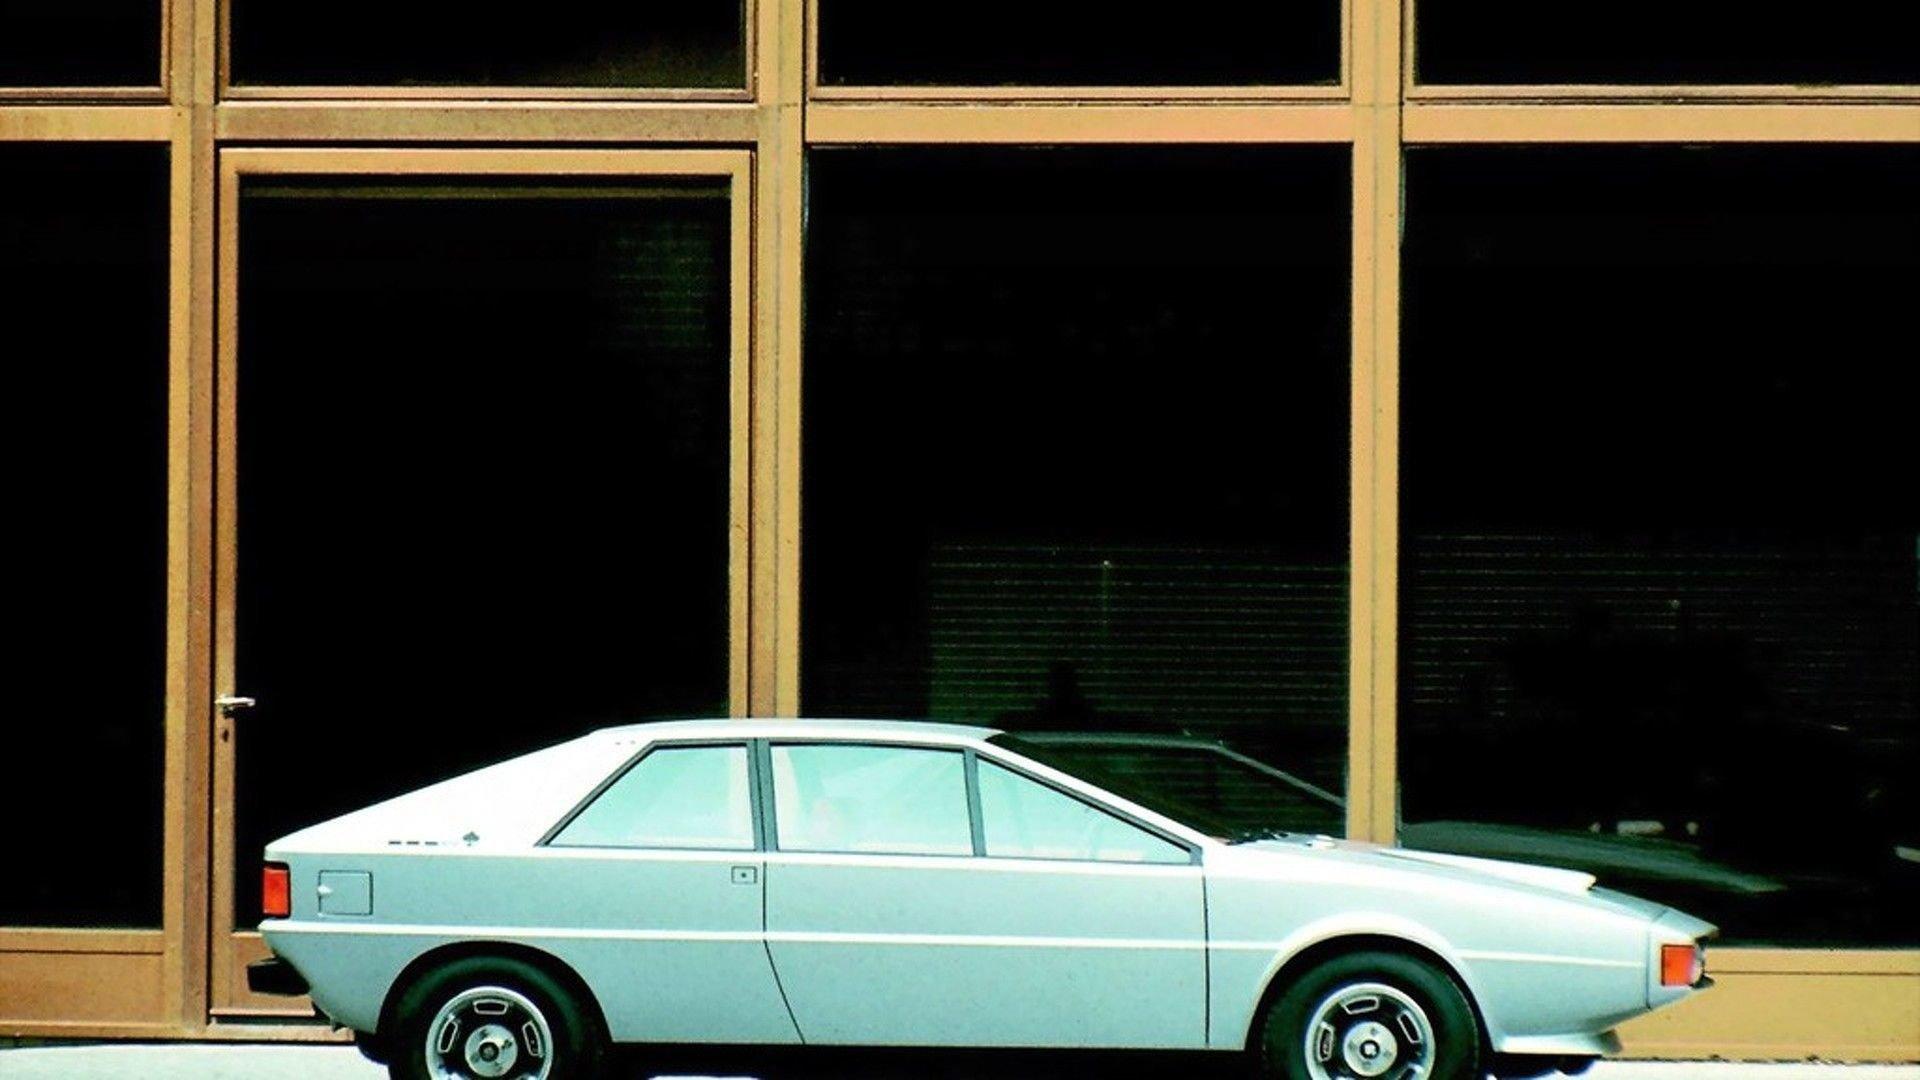 Концептуальный автомобиль Audi Karmann Asso di Picche